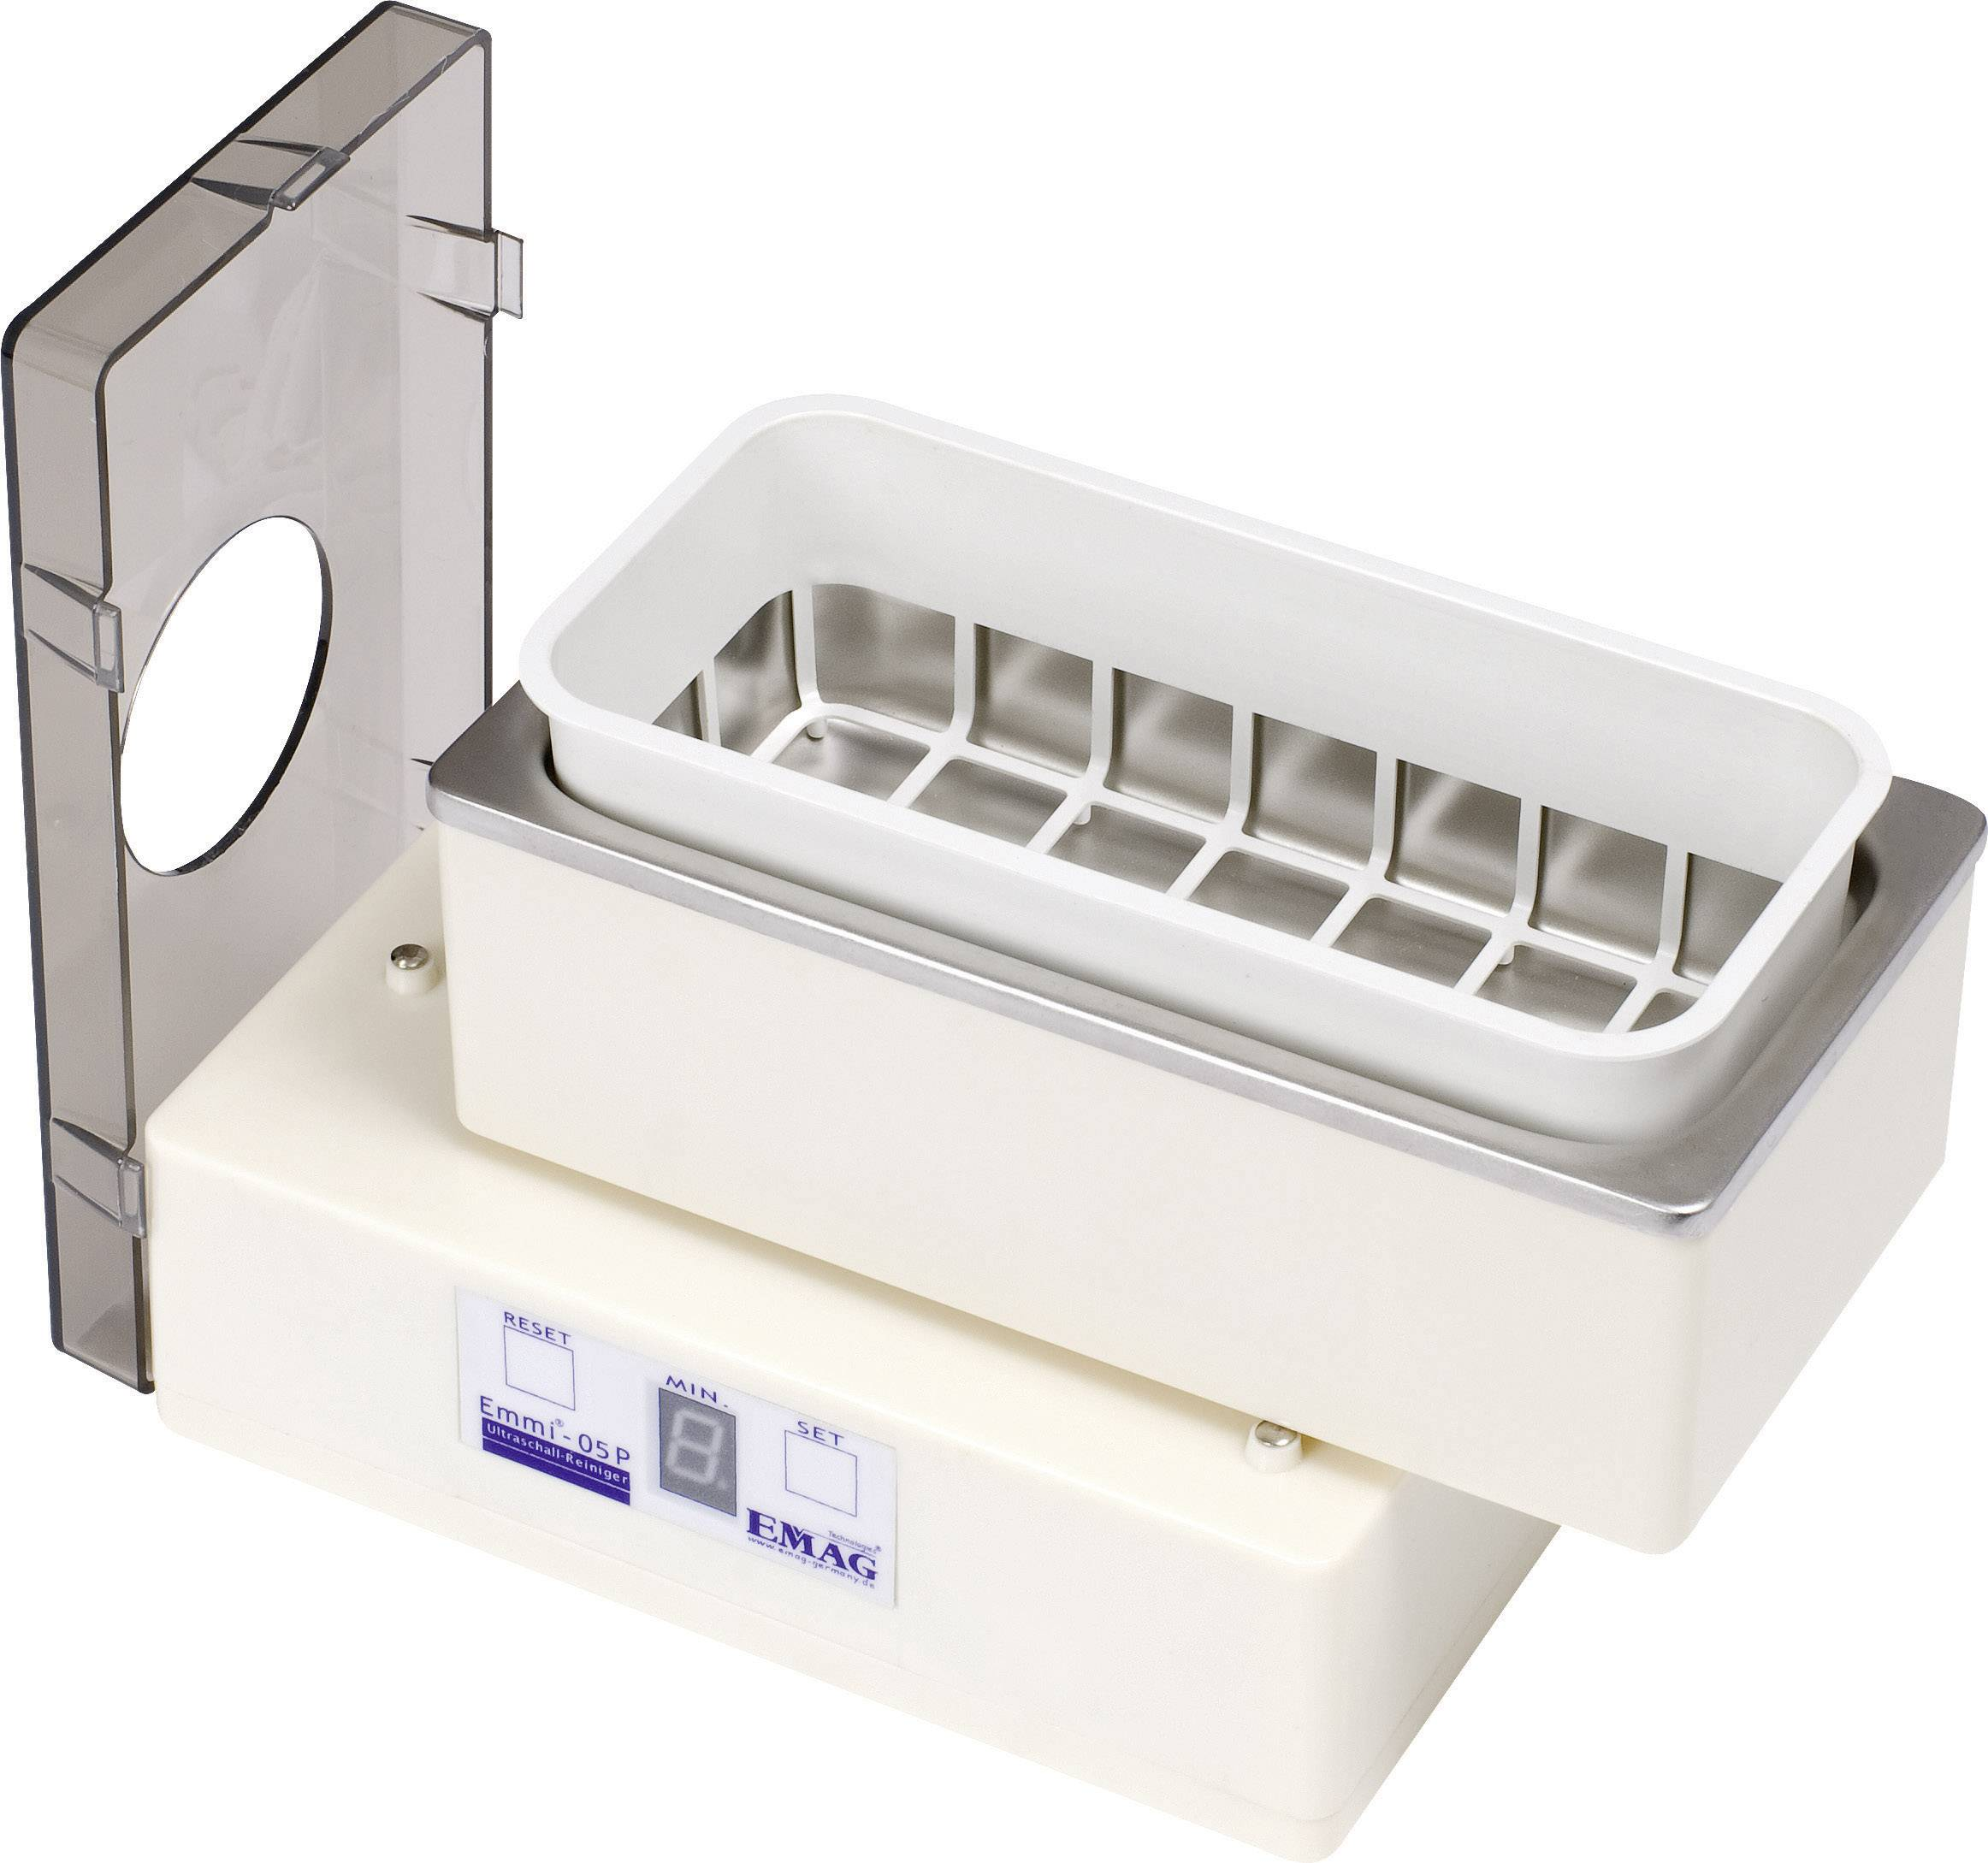 Ultrazvuková čistička Emag Emmi-5P